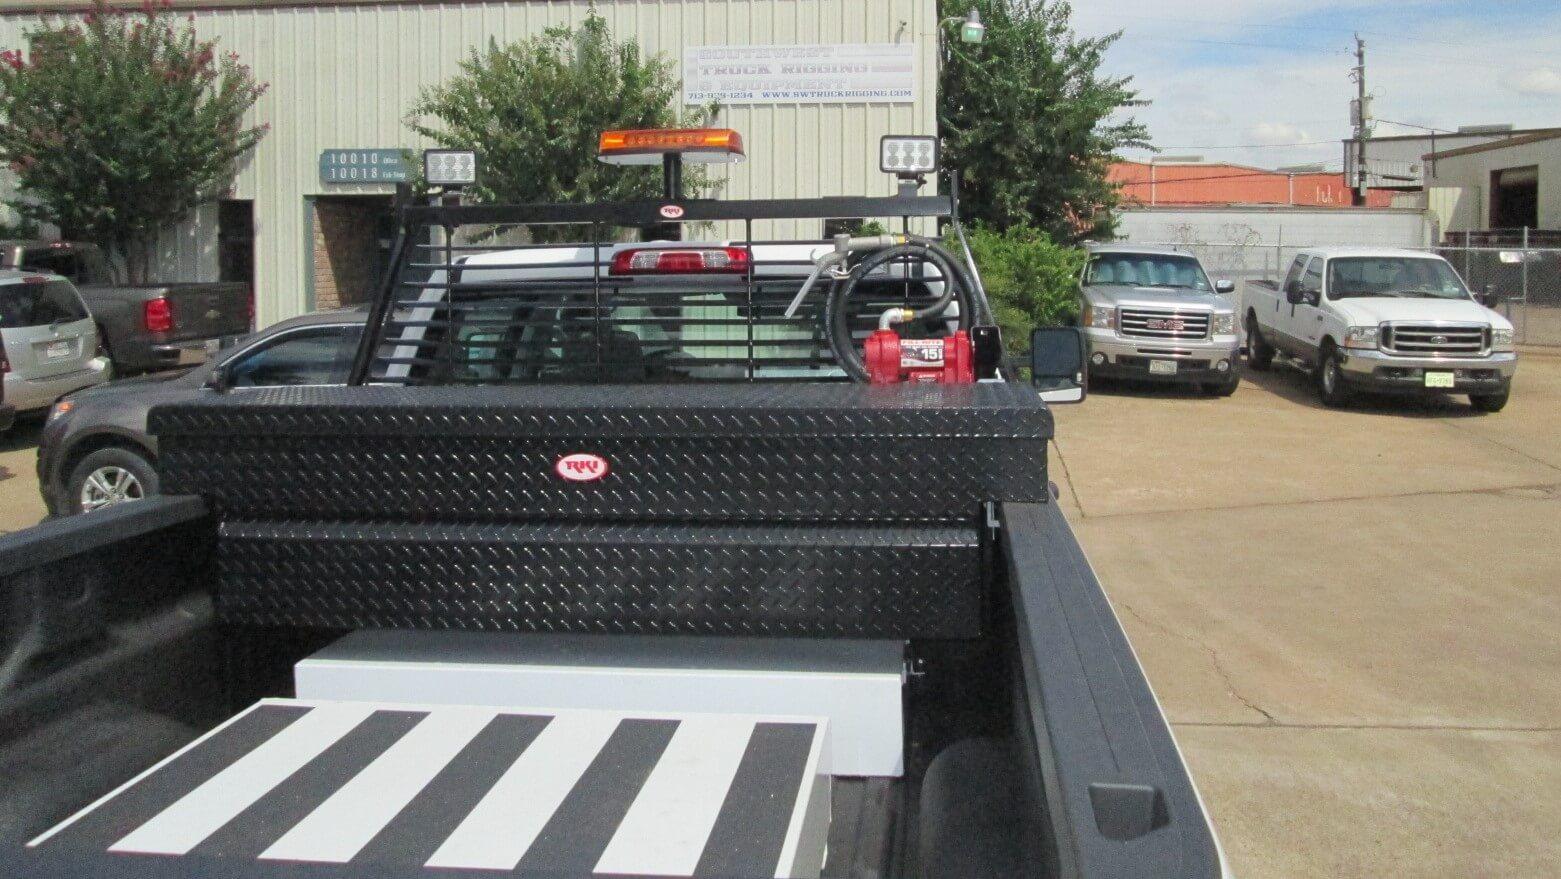 Pickup Van Southwest Truck Rigging Chevy Headache Rack 2500 With Pack Rat Work Lights Strobe Light Fuel